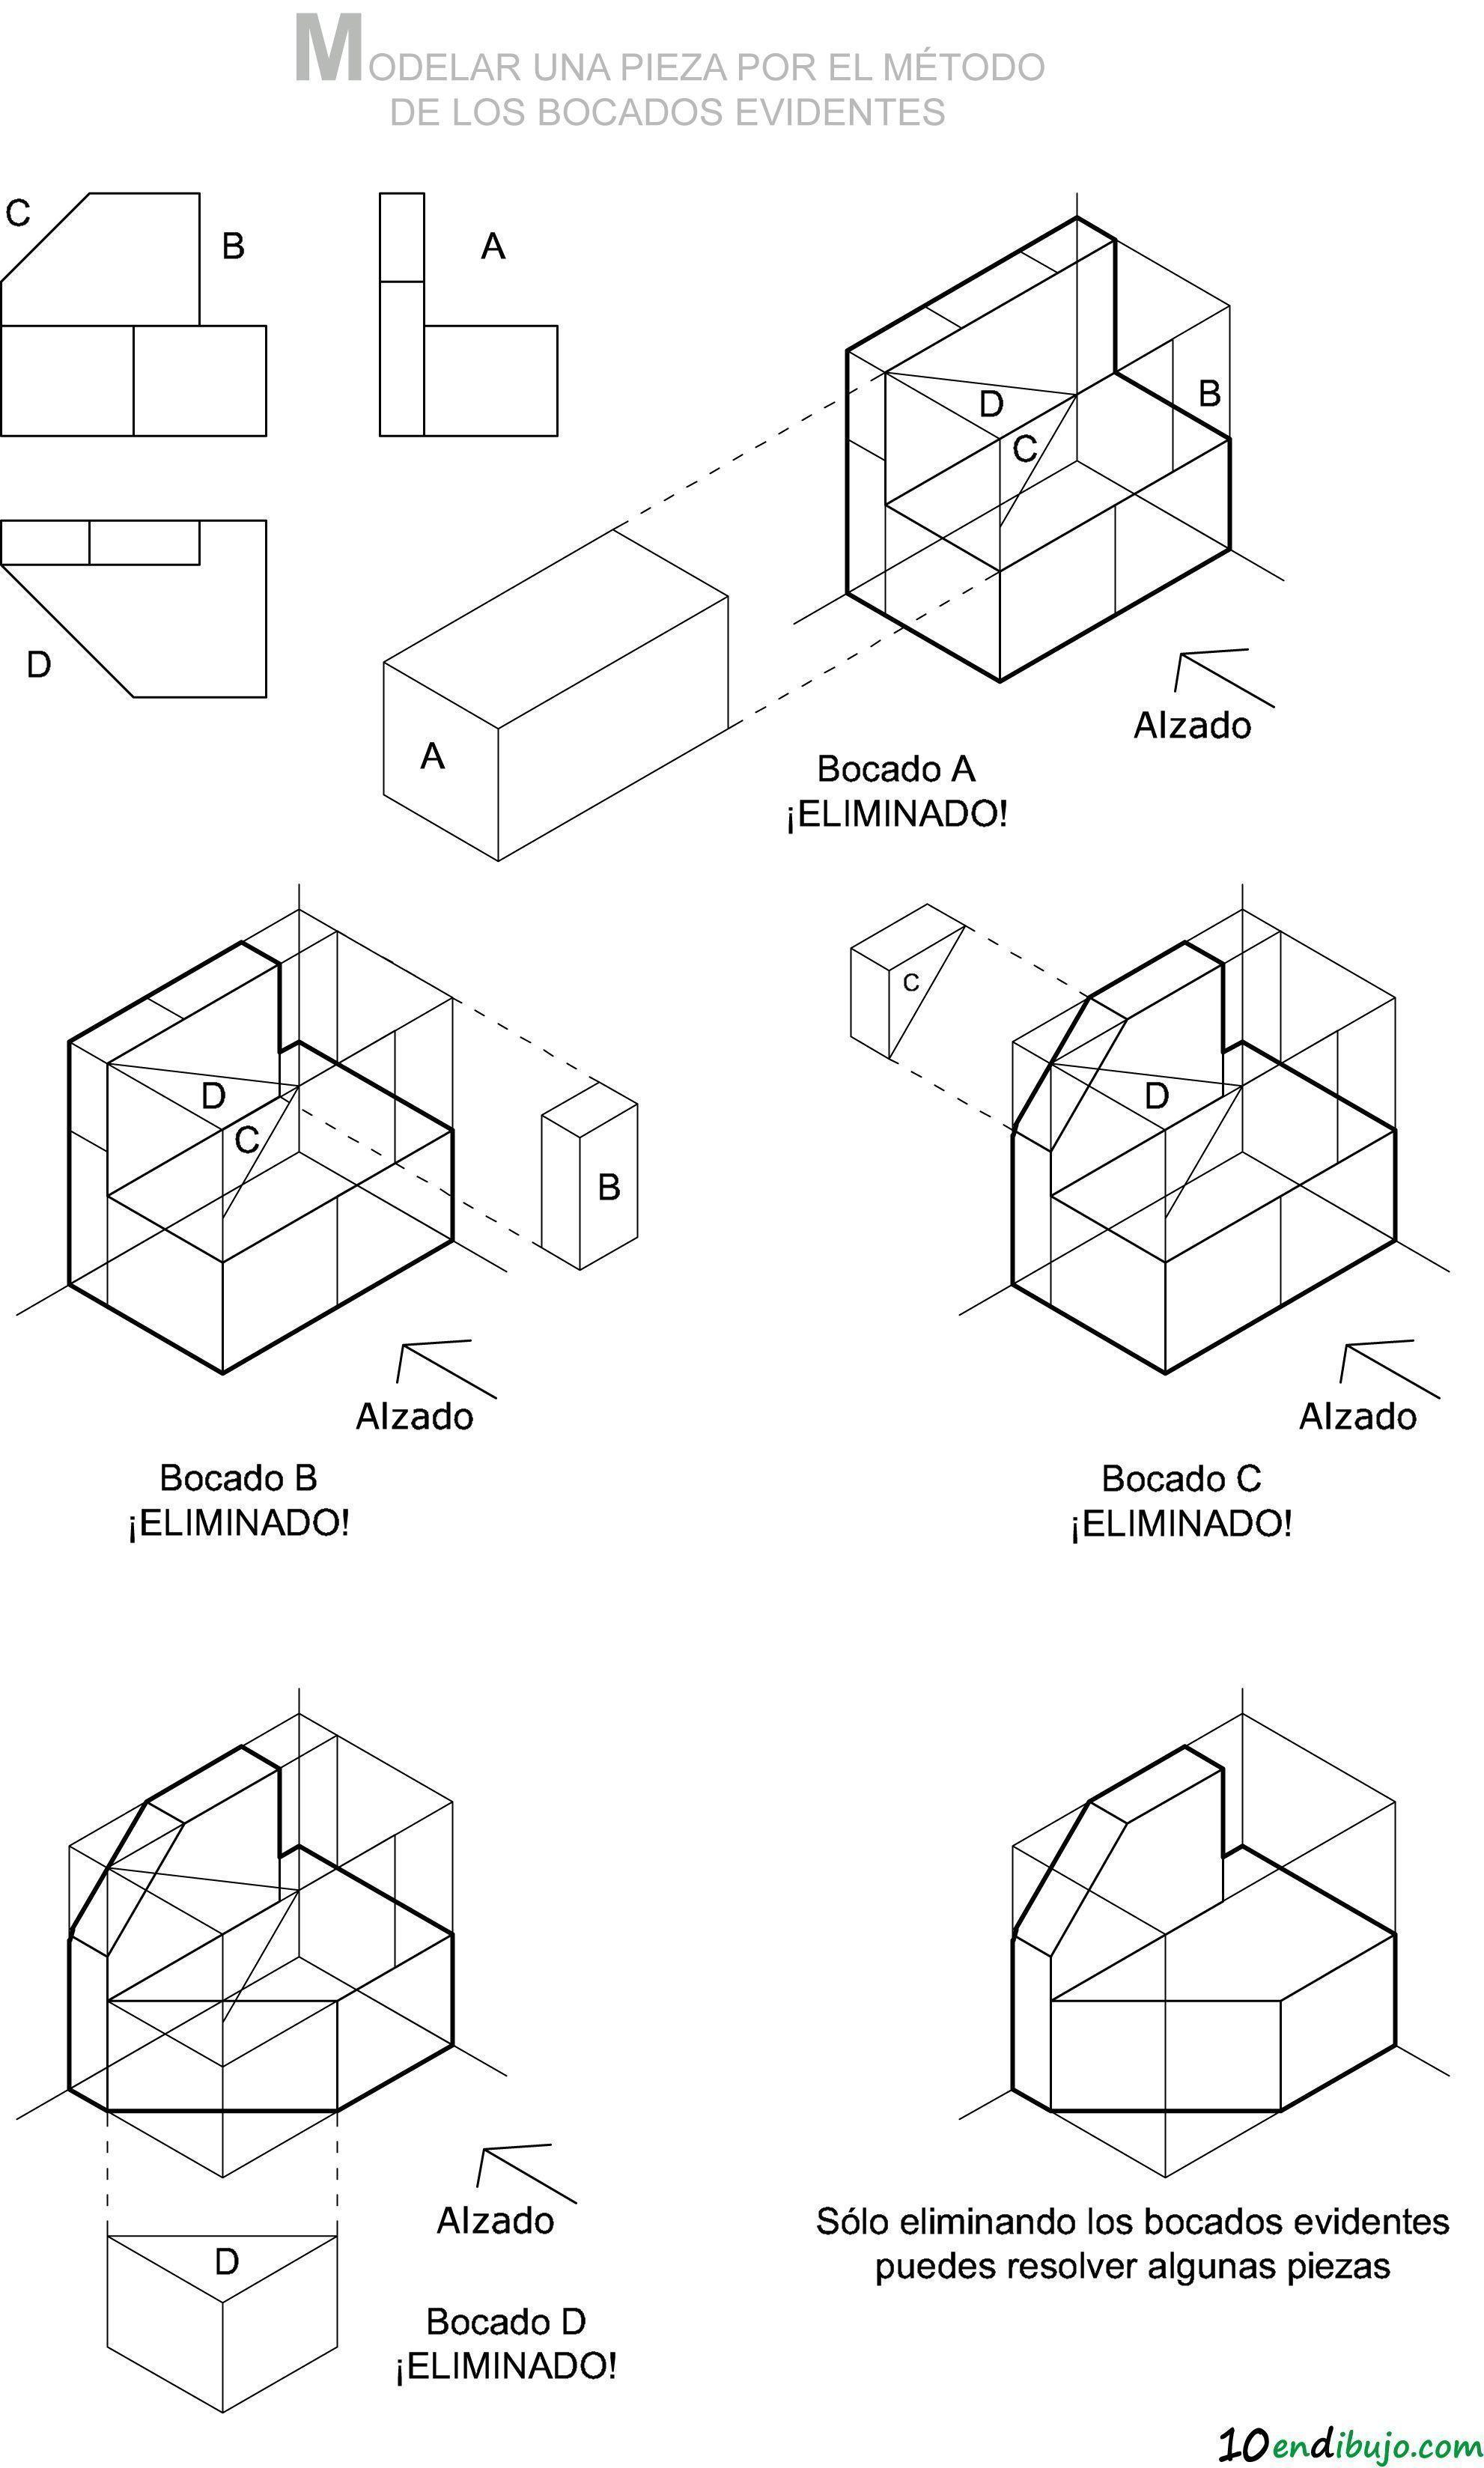 Isometrica Modelado De Pieza Tecnicas De Dibujo Perspectiva Caballera Clases De Dibujo